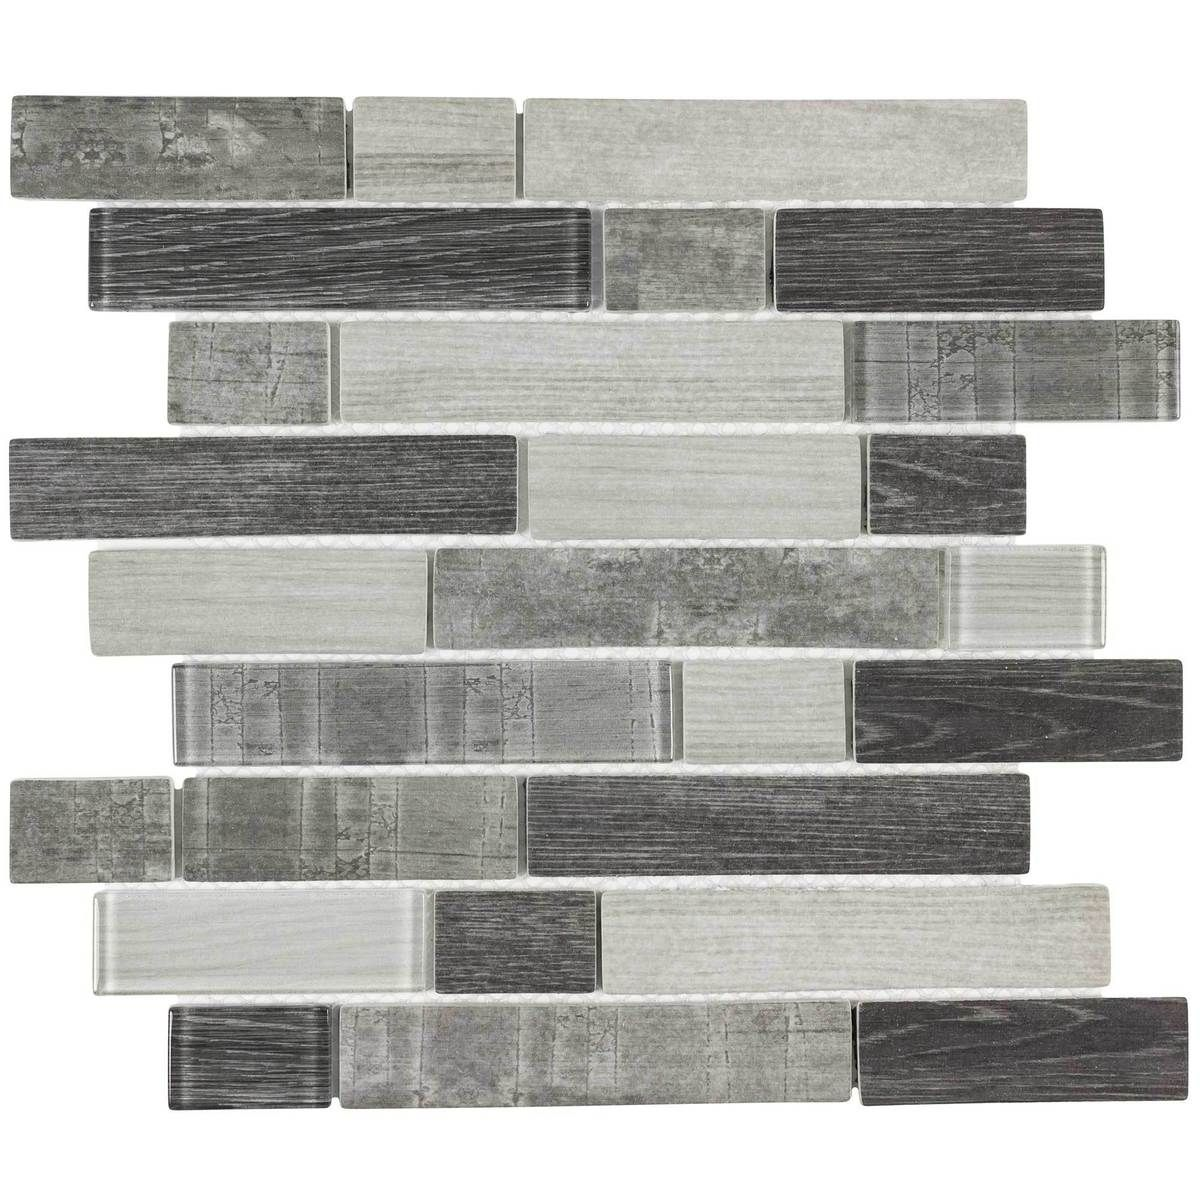 mto0335 modern linear gray glossy wood grain recycled glass mosaic rh pinterest com